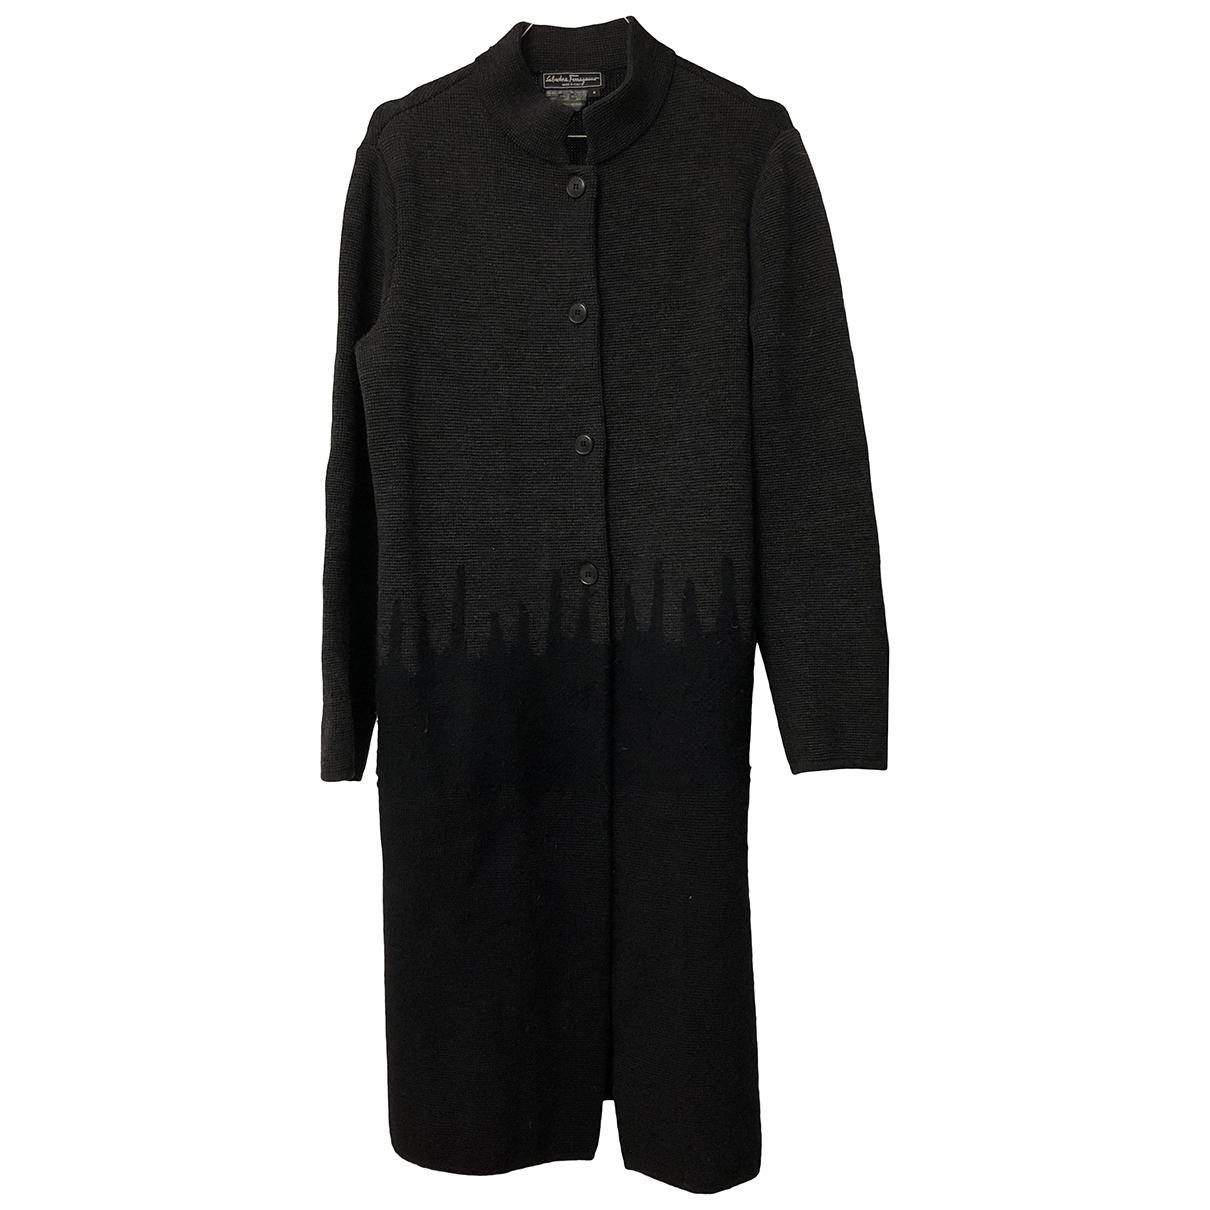 Salvatore Ferragamo \N Anthracite Wool coat for Women S International